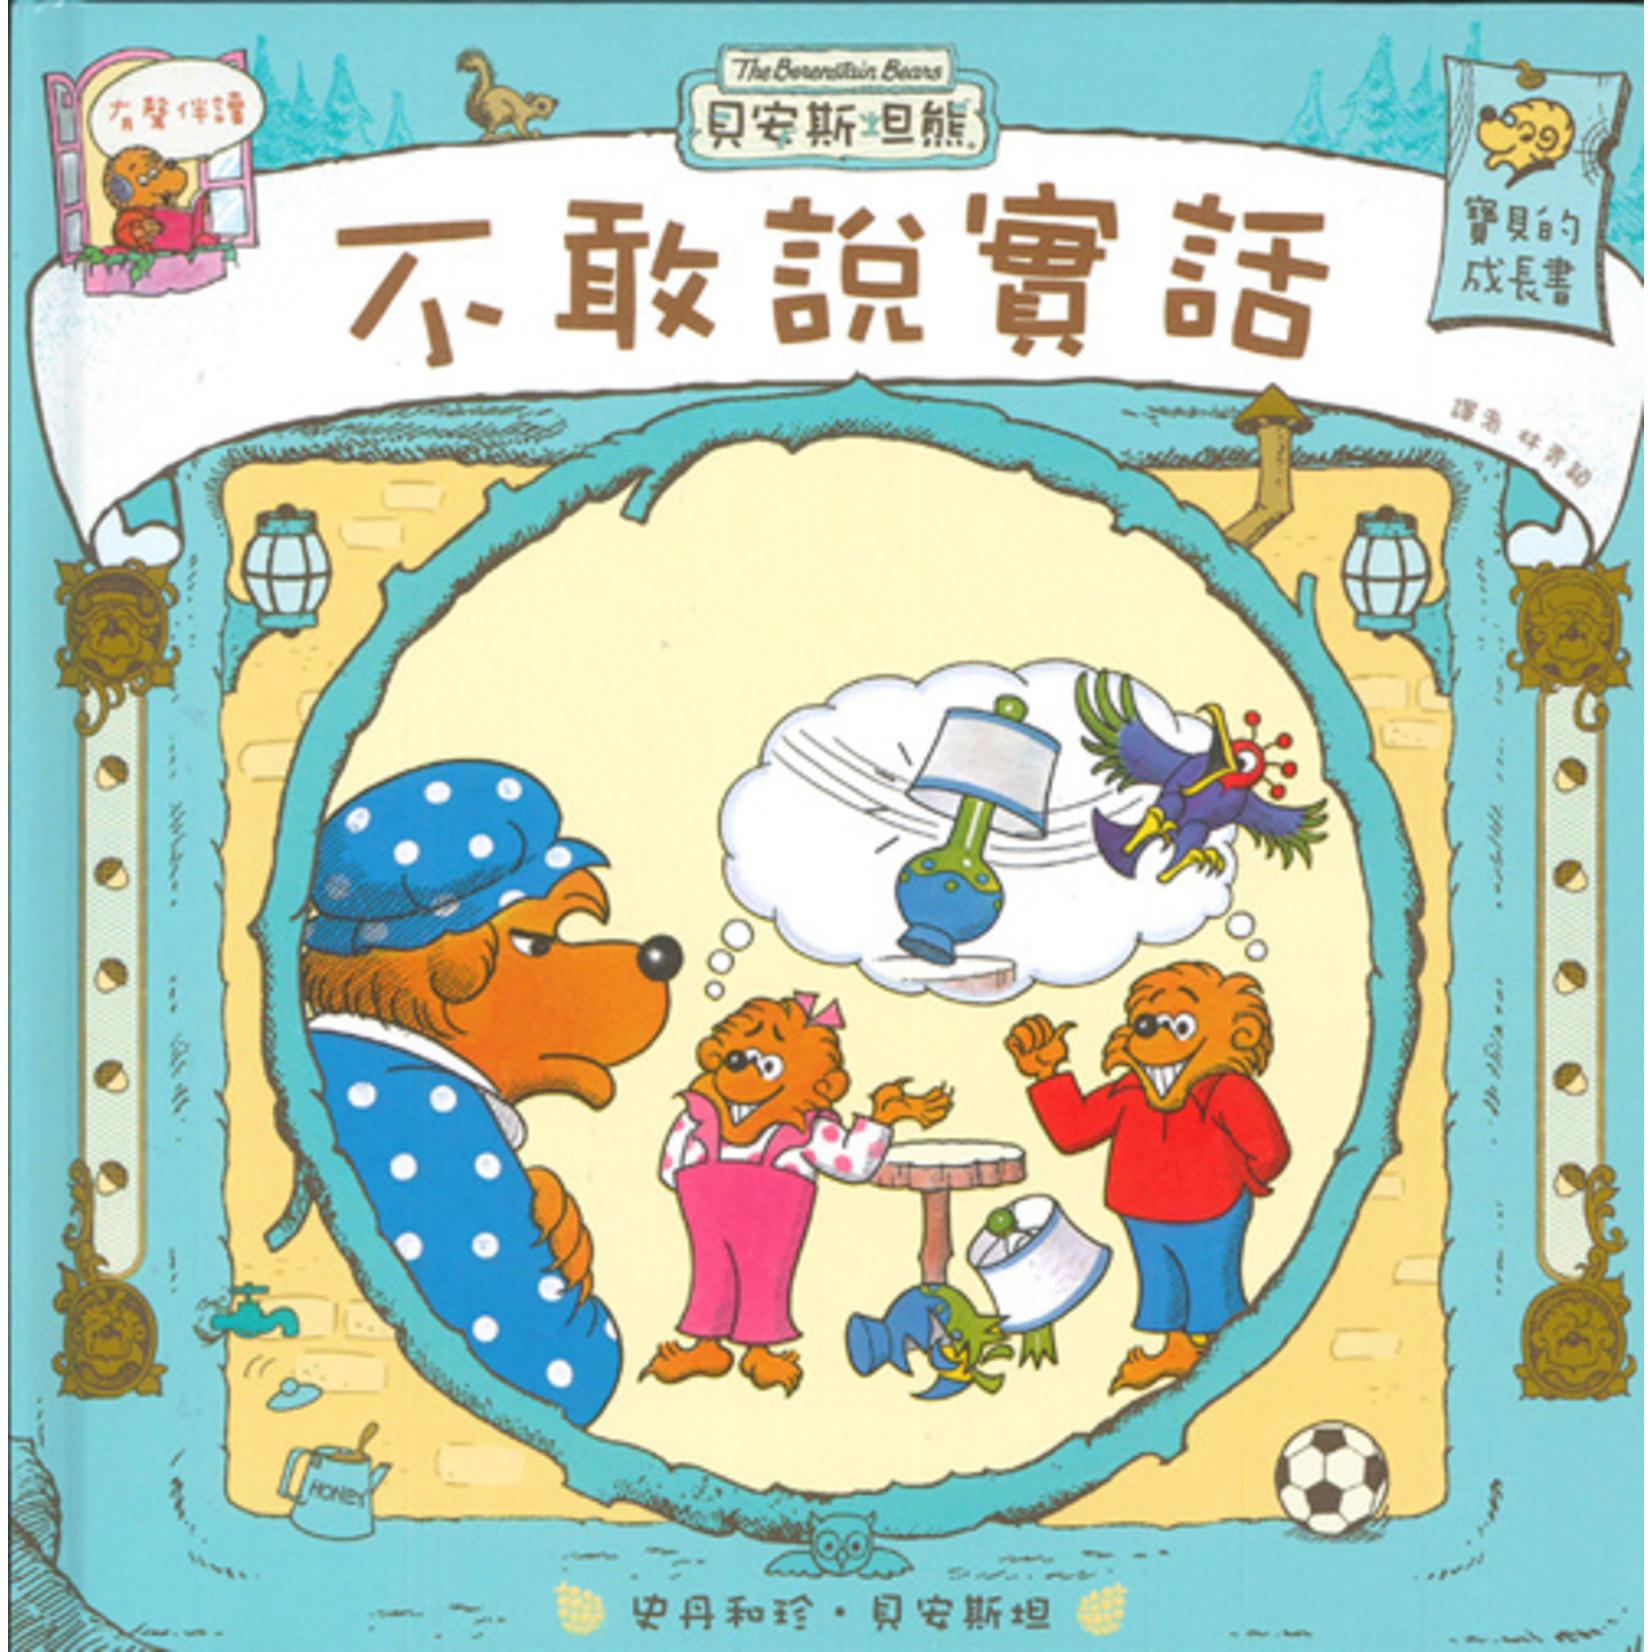 生命樹 Life Tree Global 貝安斯坦熊系列16:不敢說實話  The Berenstain Bears 16: The Truth